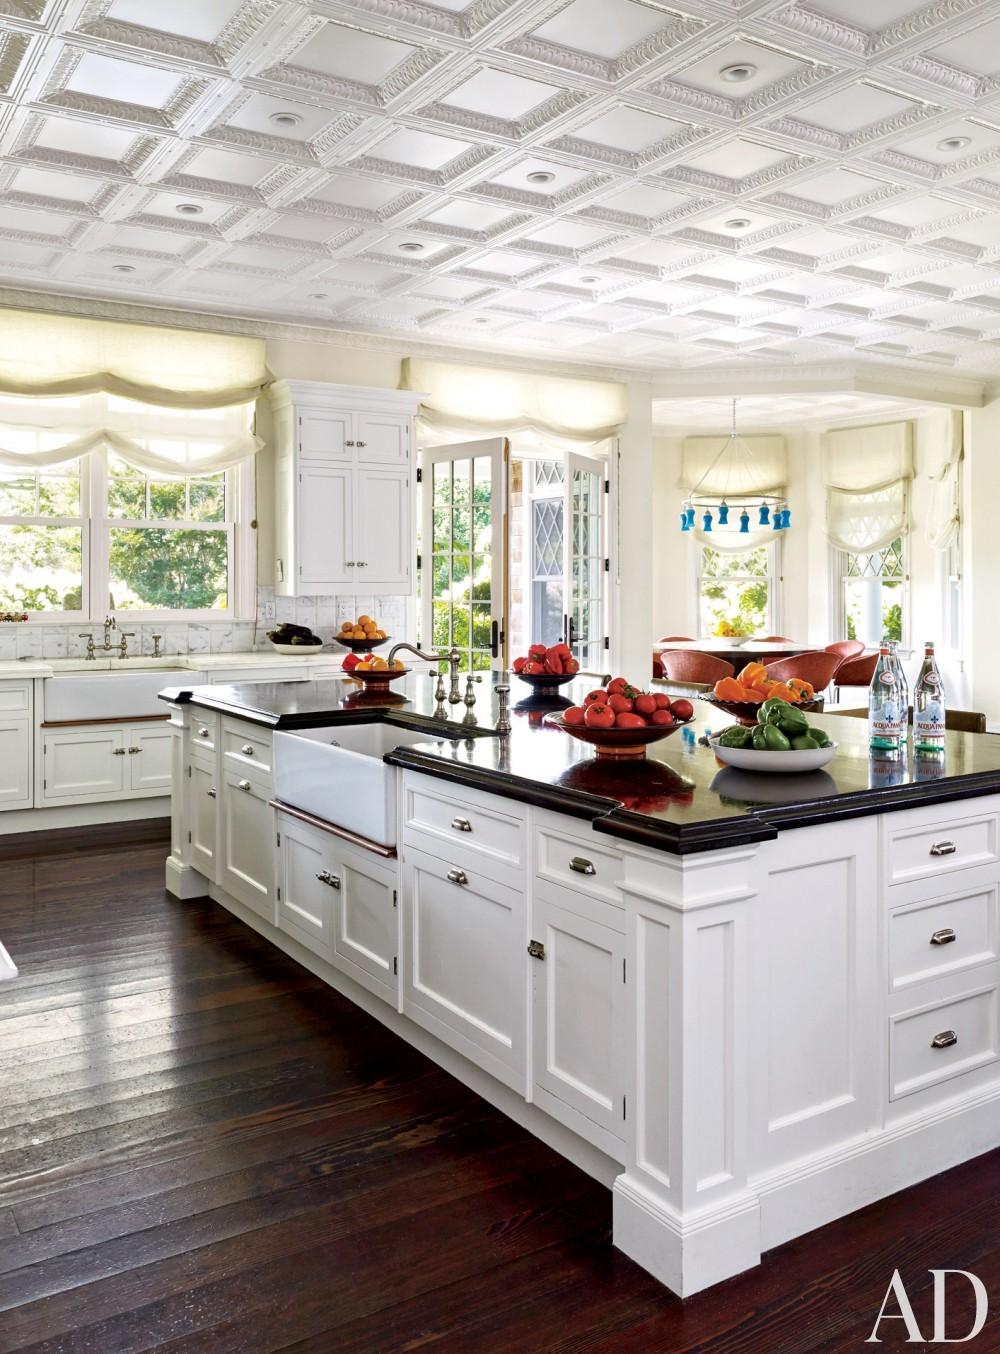 Contemporary kitchen by Juan Montoya Design in Southampton, NY